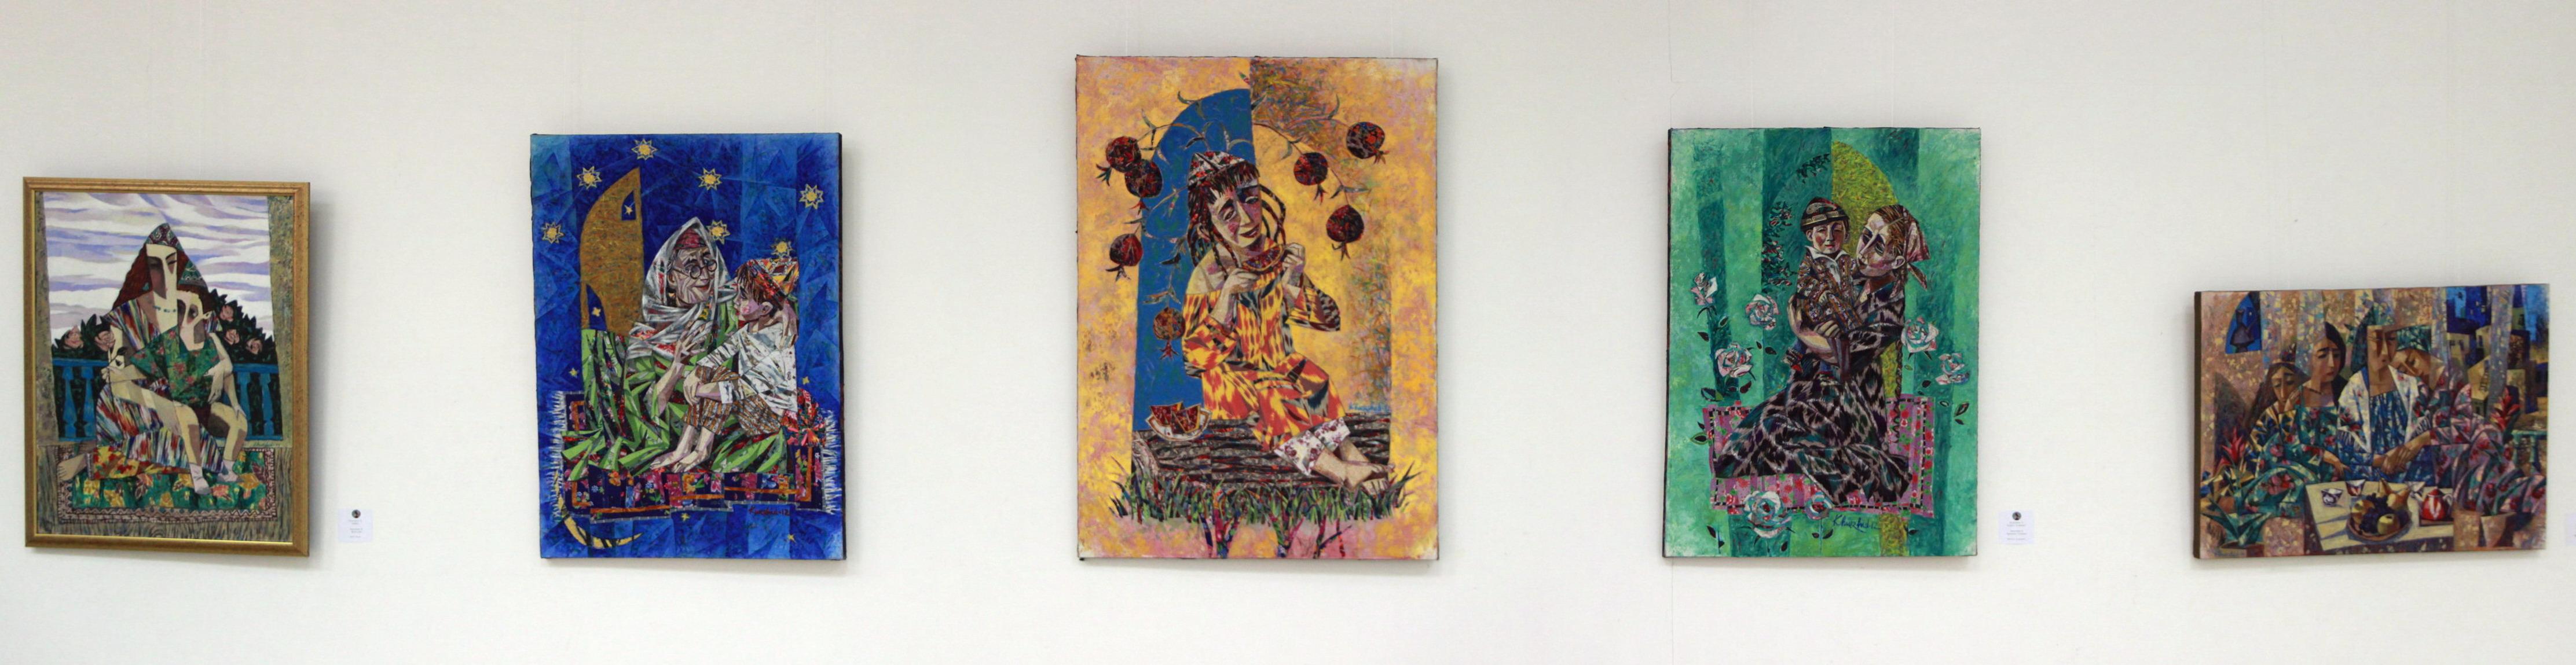 Хуршид Зияханов Экспозиция картин.